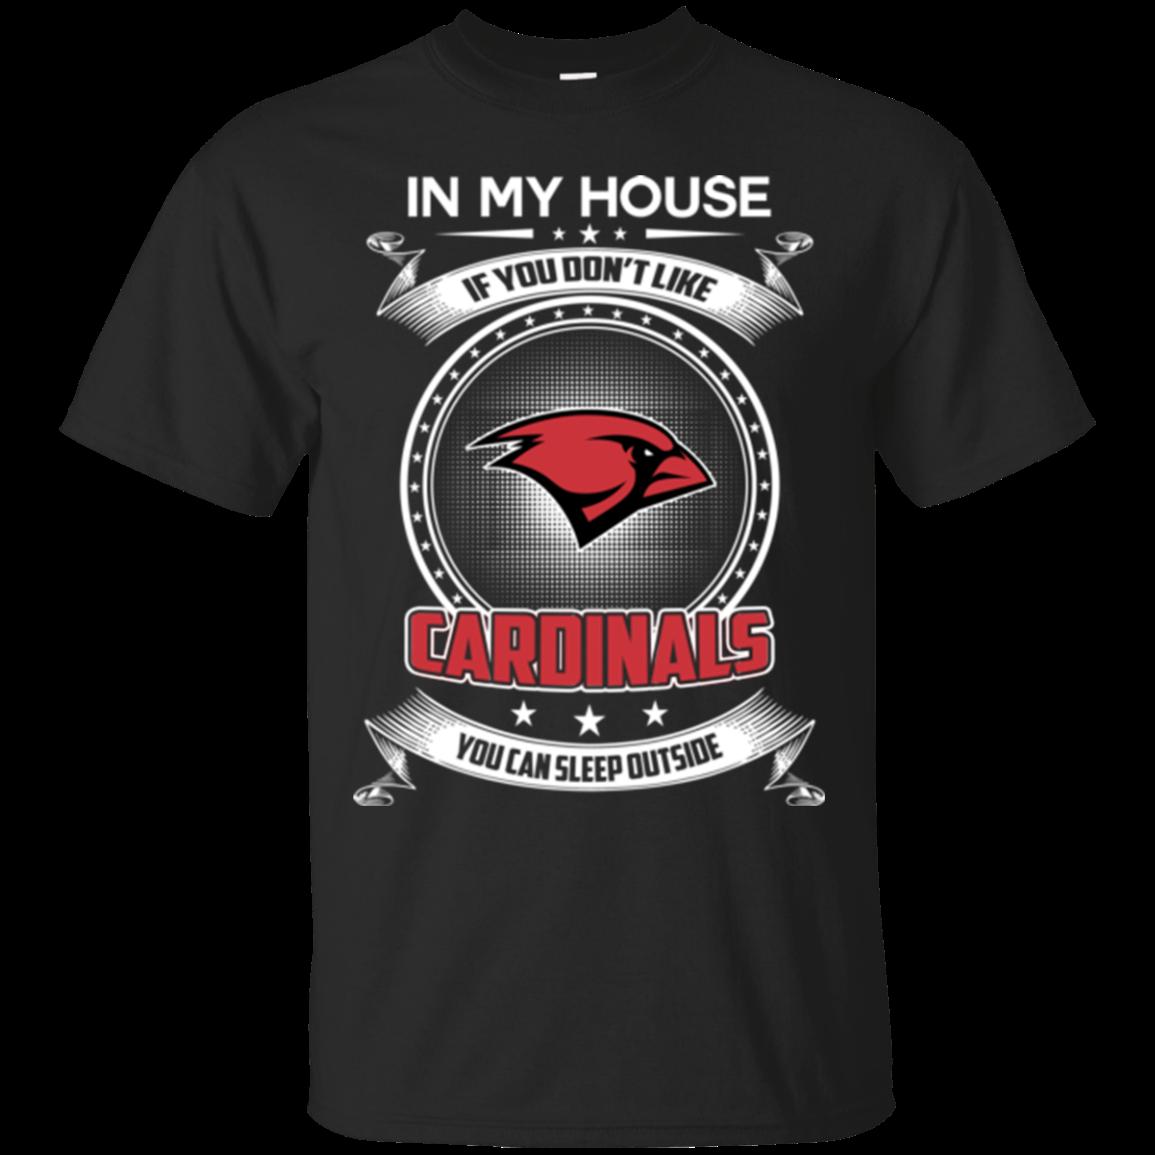 NCAA Incarnate Word Cardinals T-Shirt V2